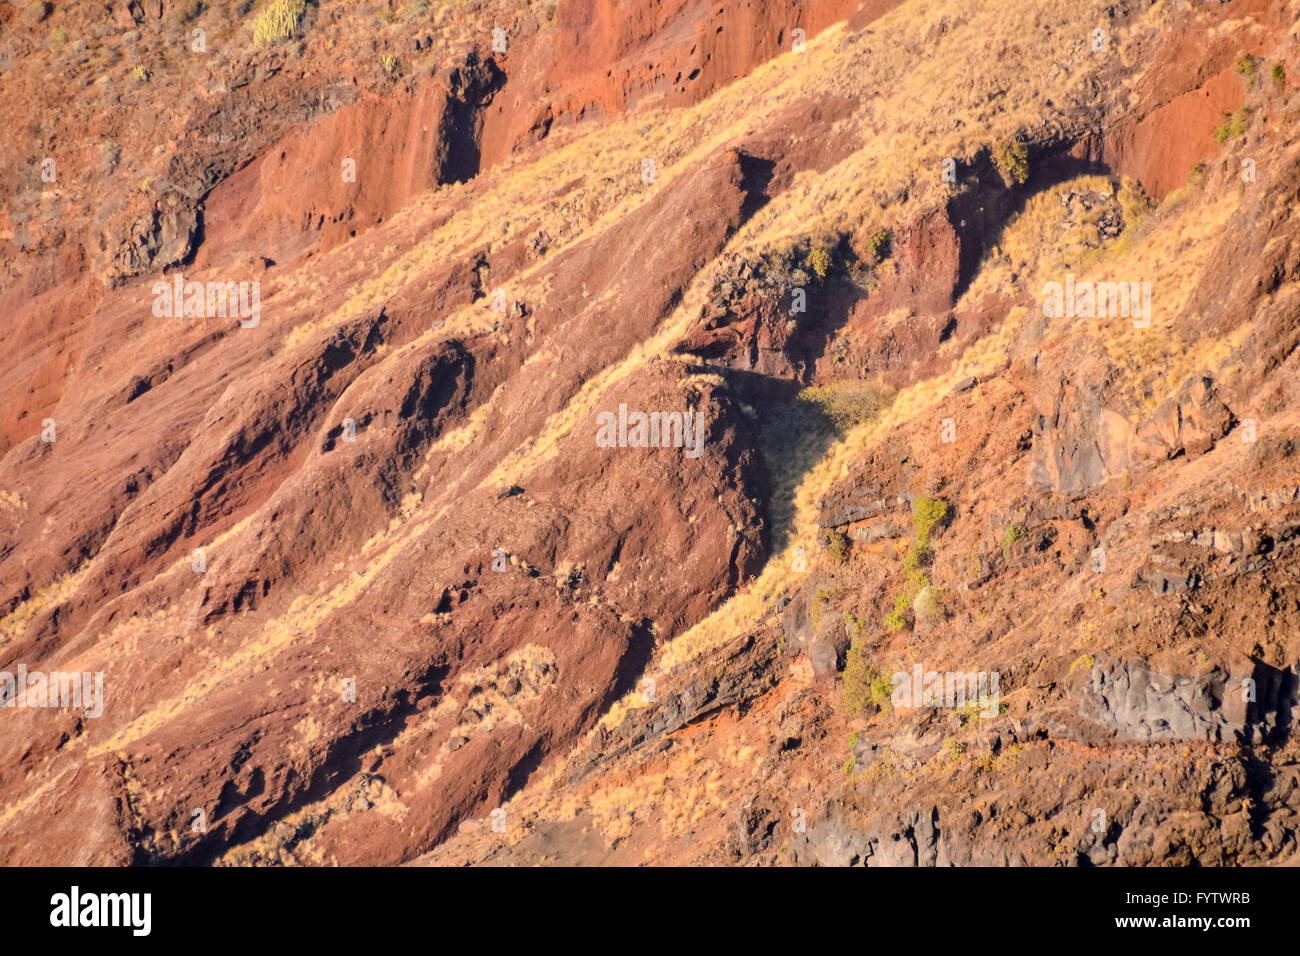 Basaltic Rock Texture - Stock Image